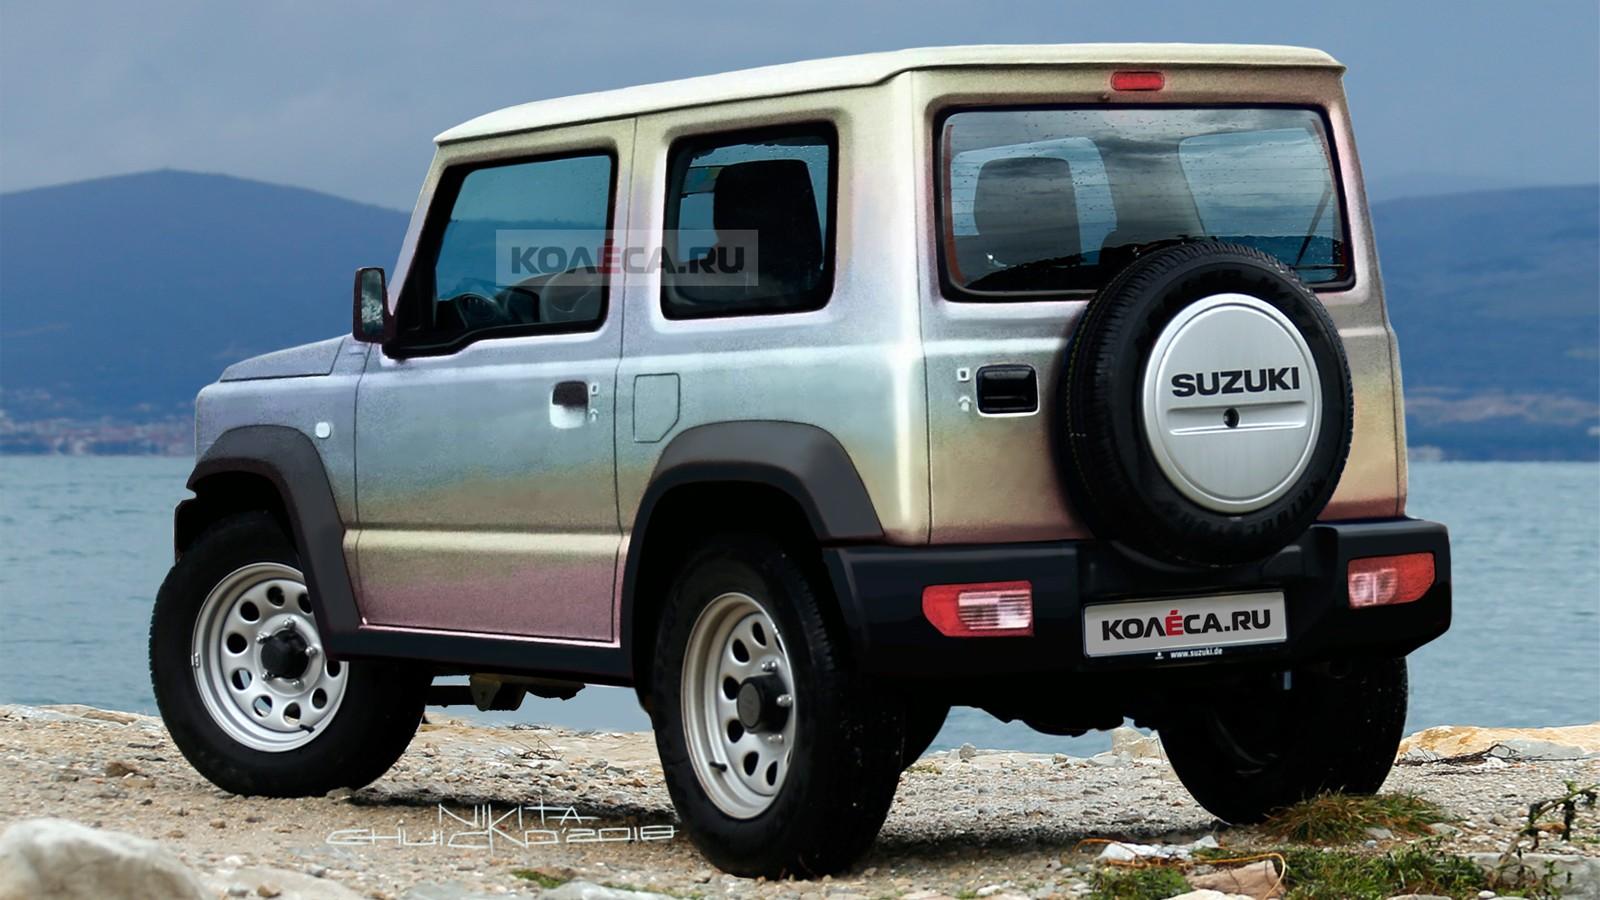 Suzuki Jimny rear1